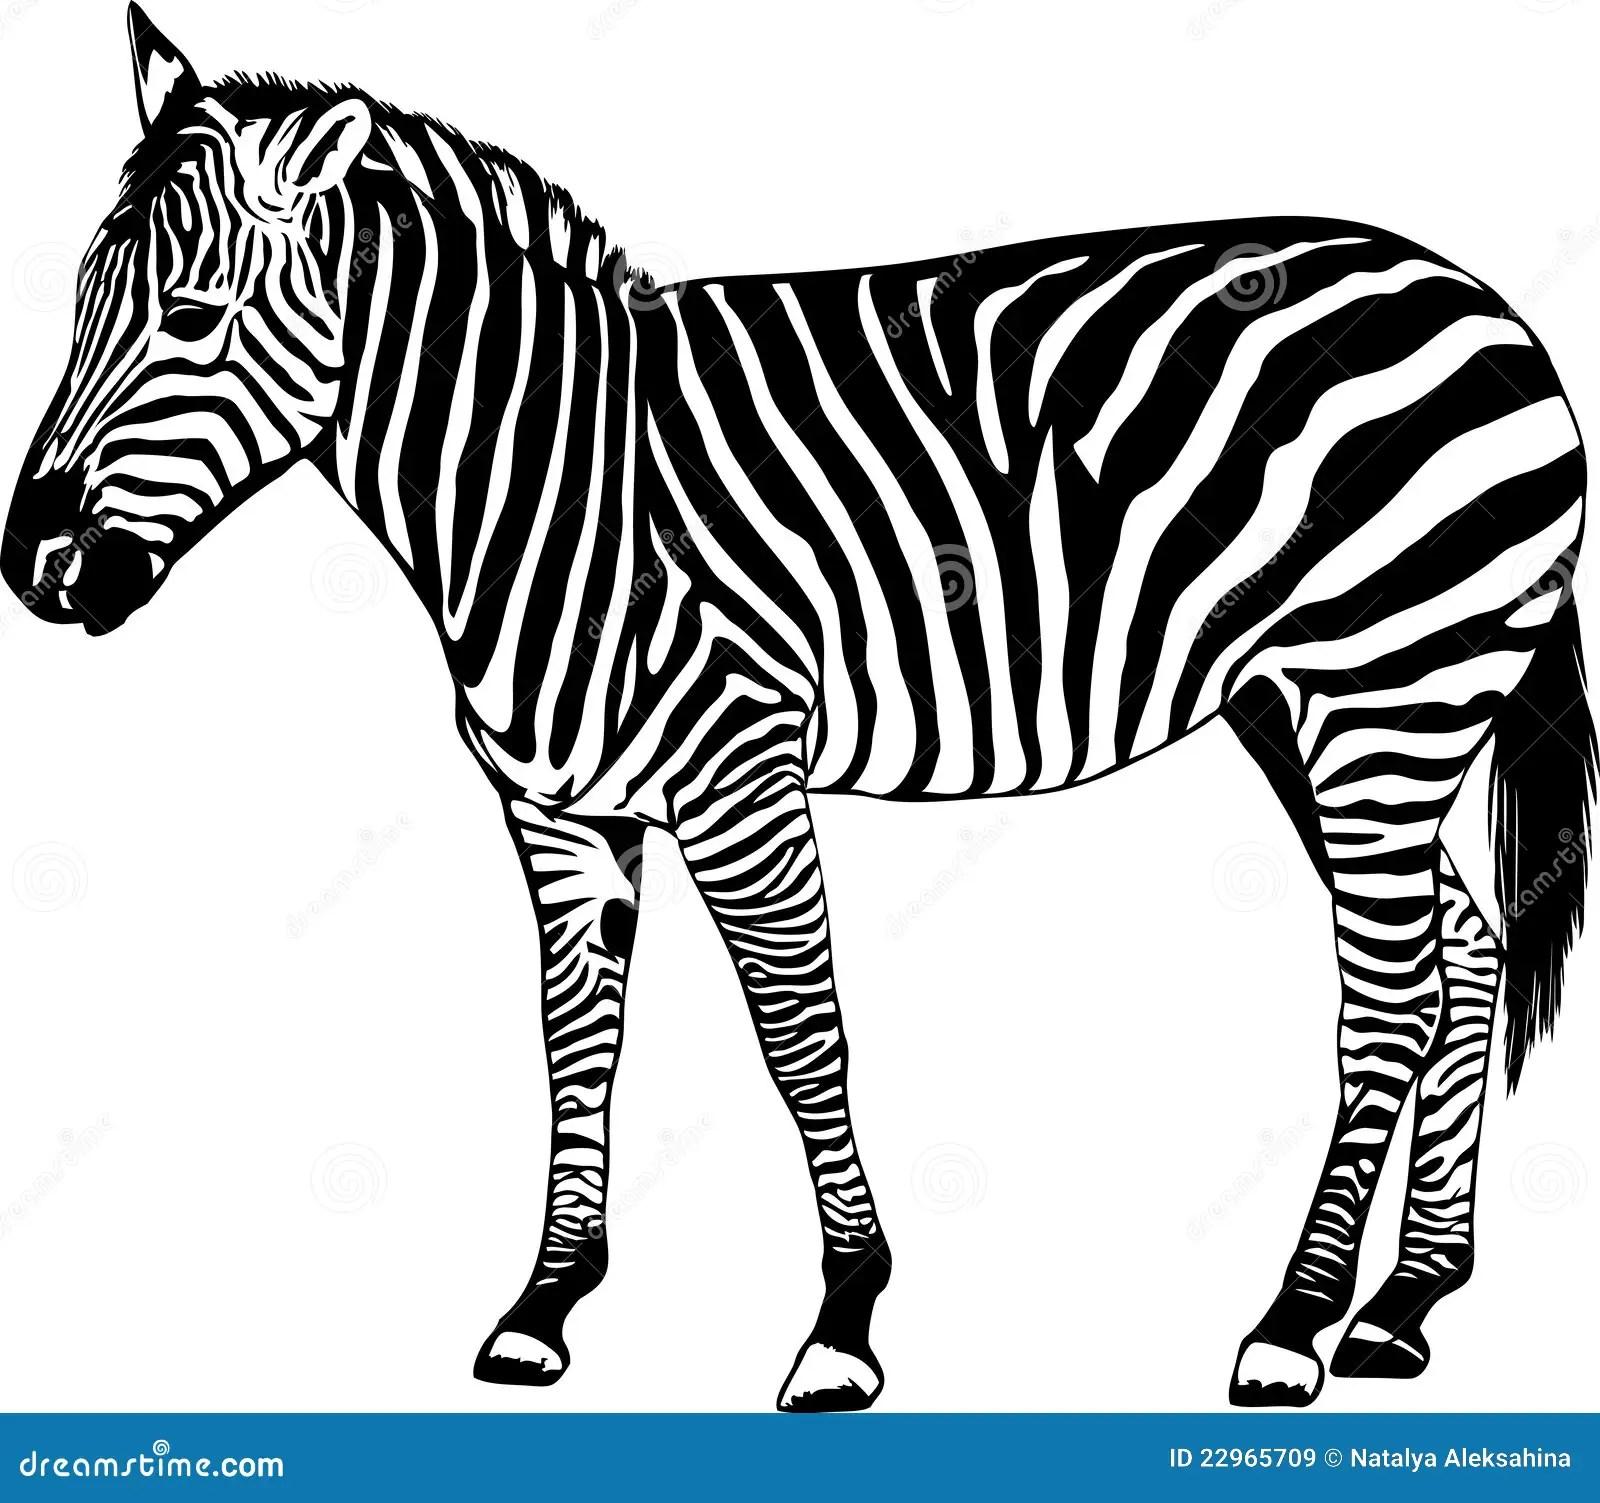 Zebra Vector Illustration Stock Vector Illustration Of